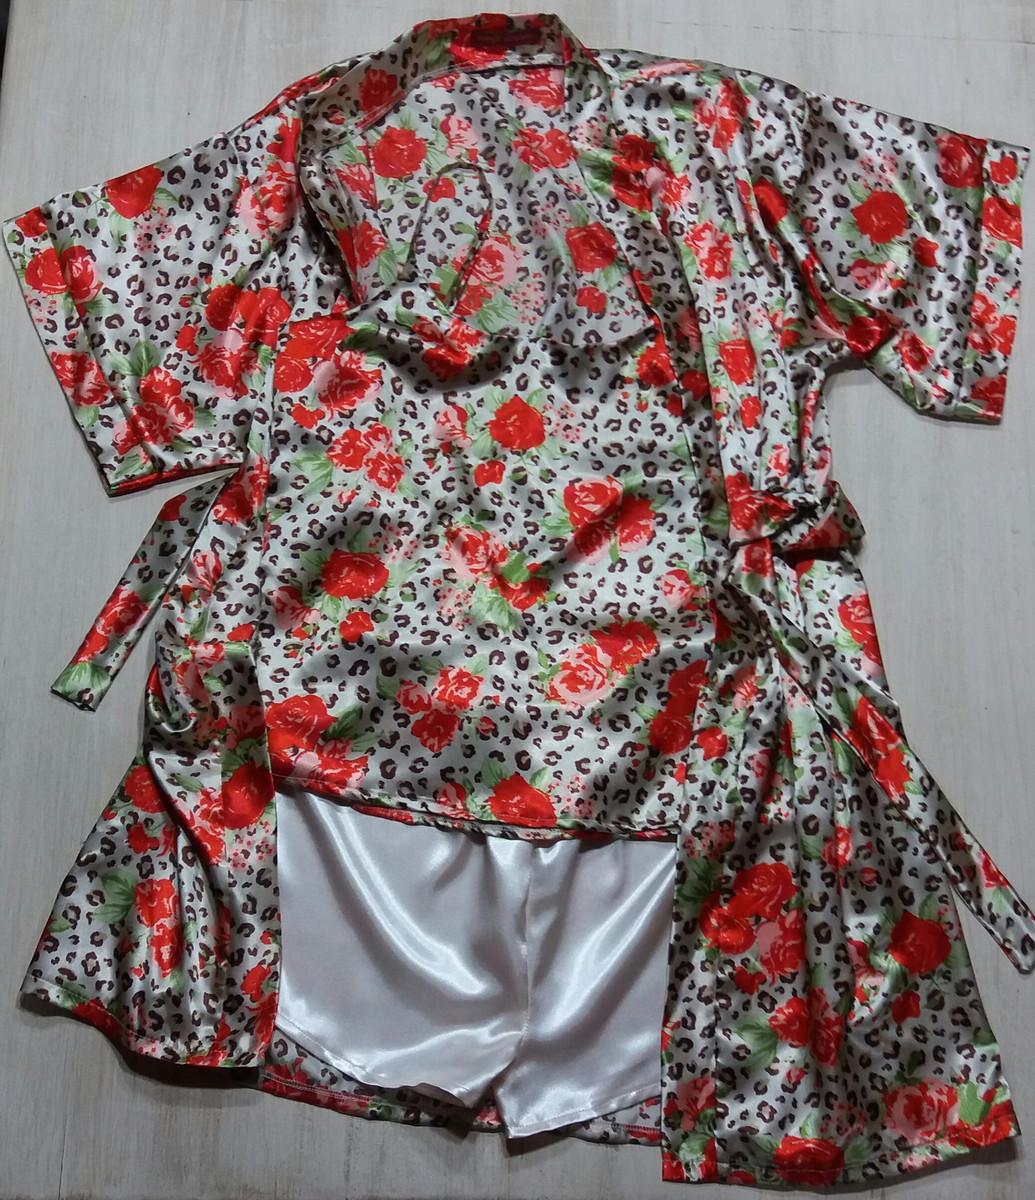 cd1aa8400 Robe e pijama cetim charmeusse no Elo7